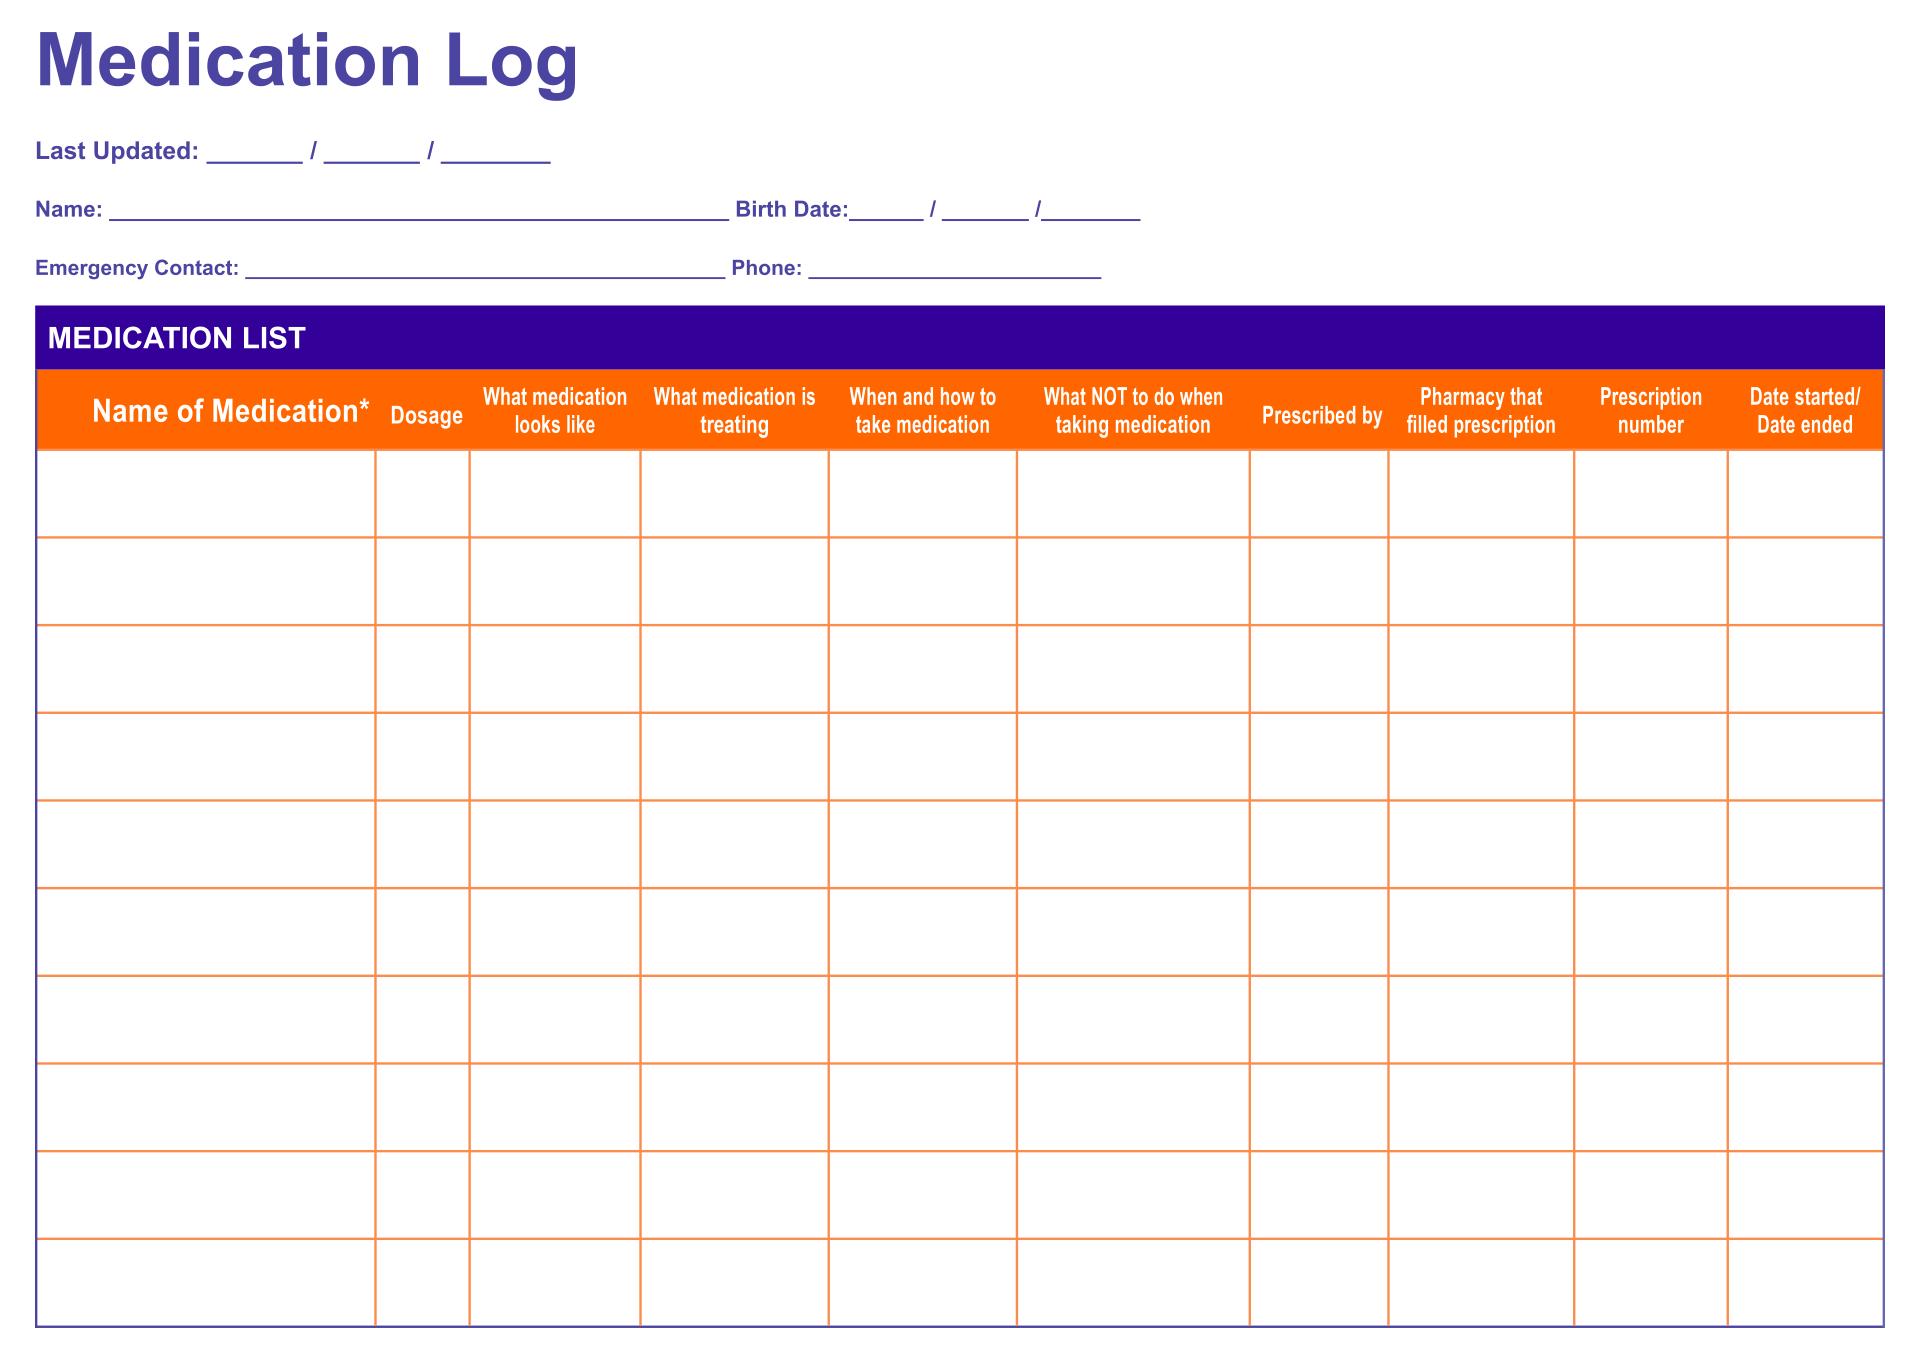 Medication Log Sheet Template